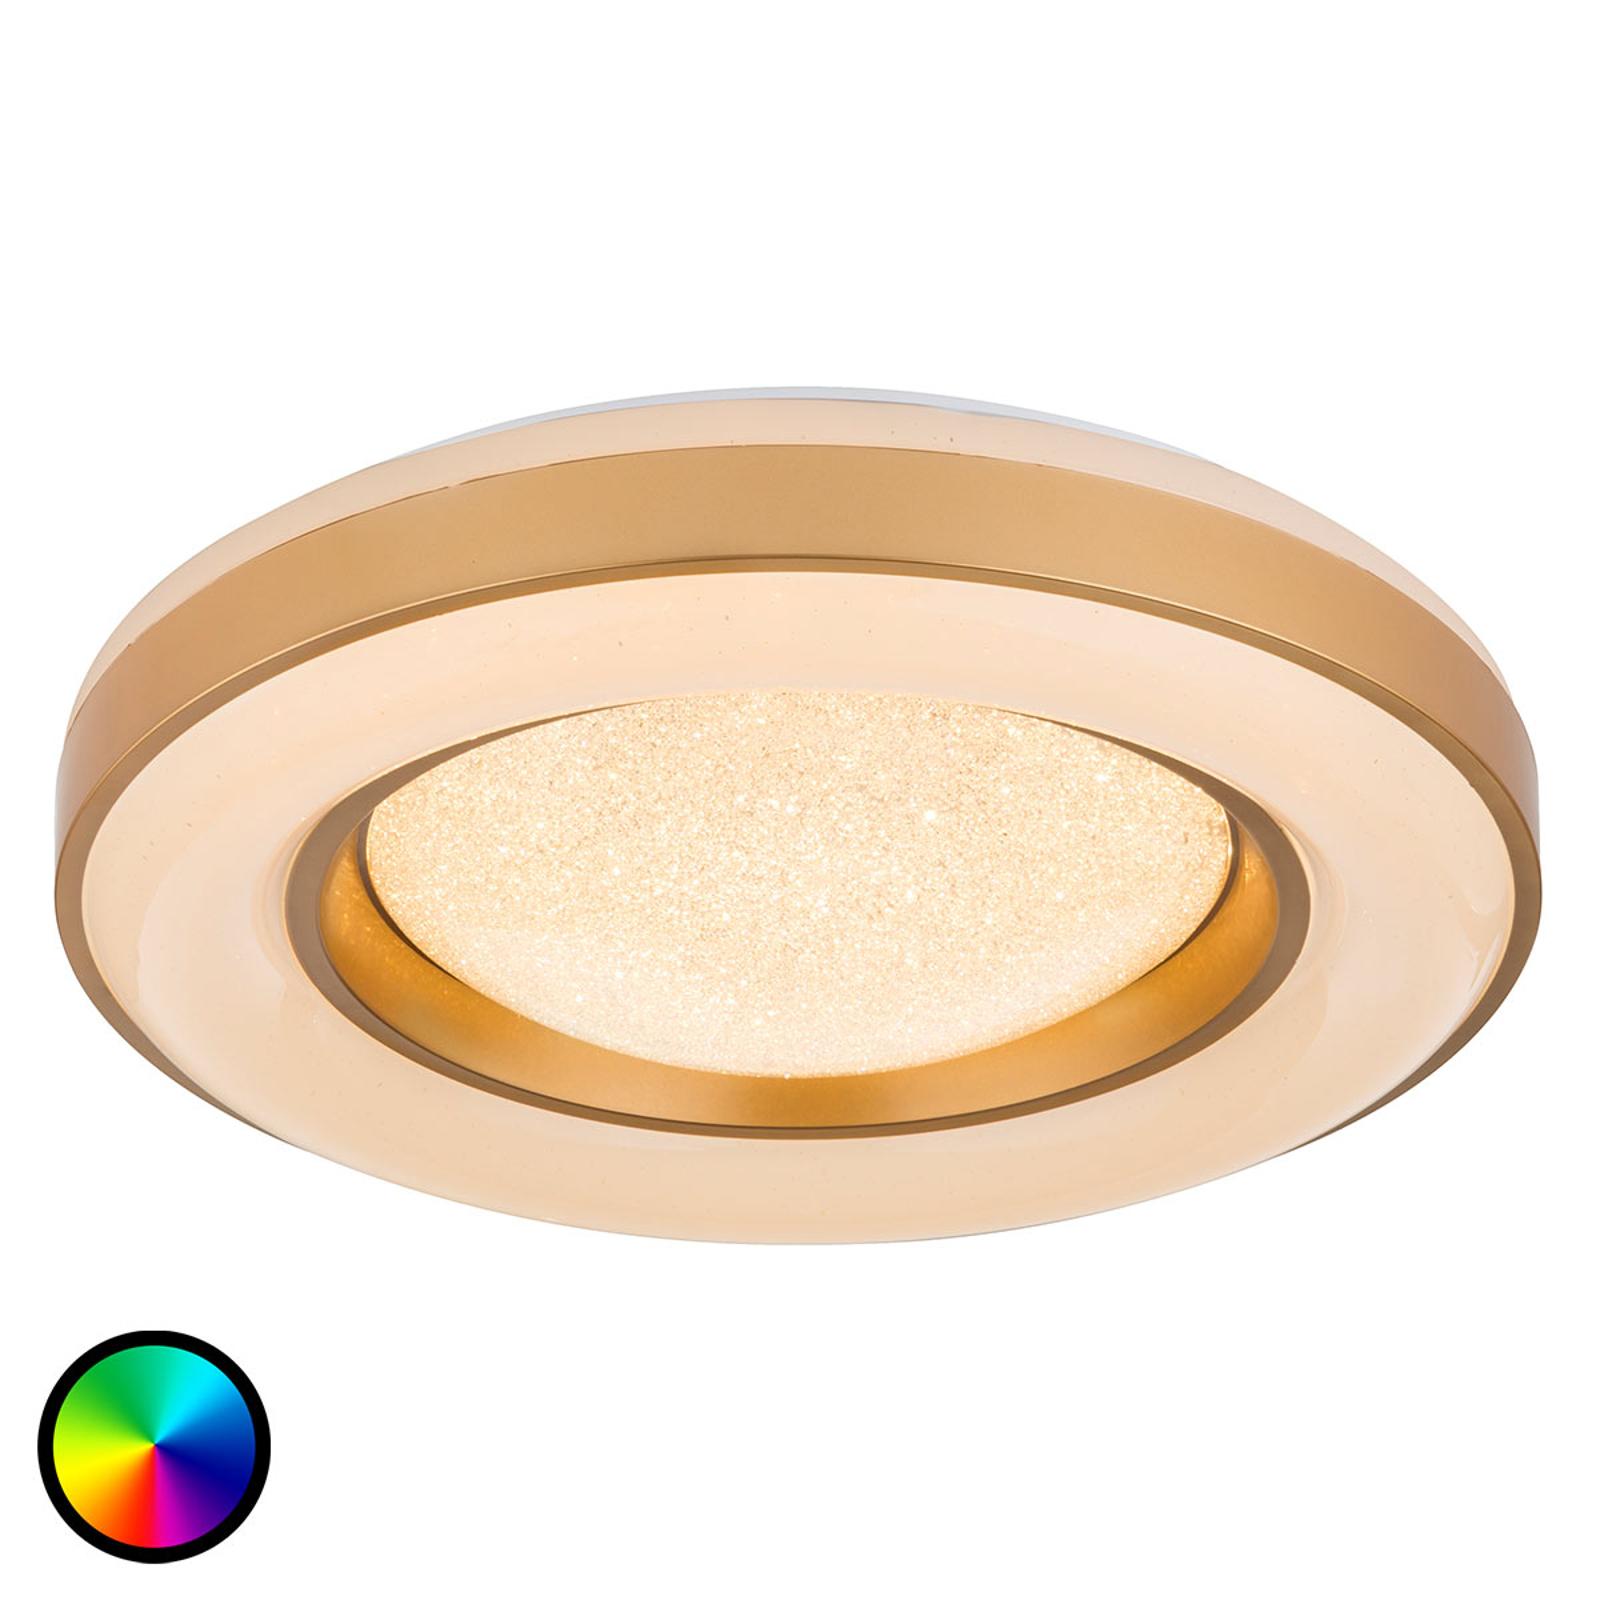 Ściemniana lampa sufitowa LED Colla